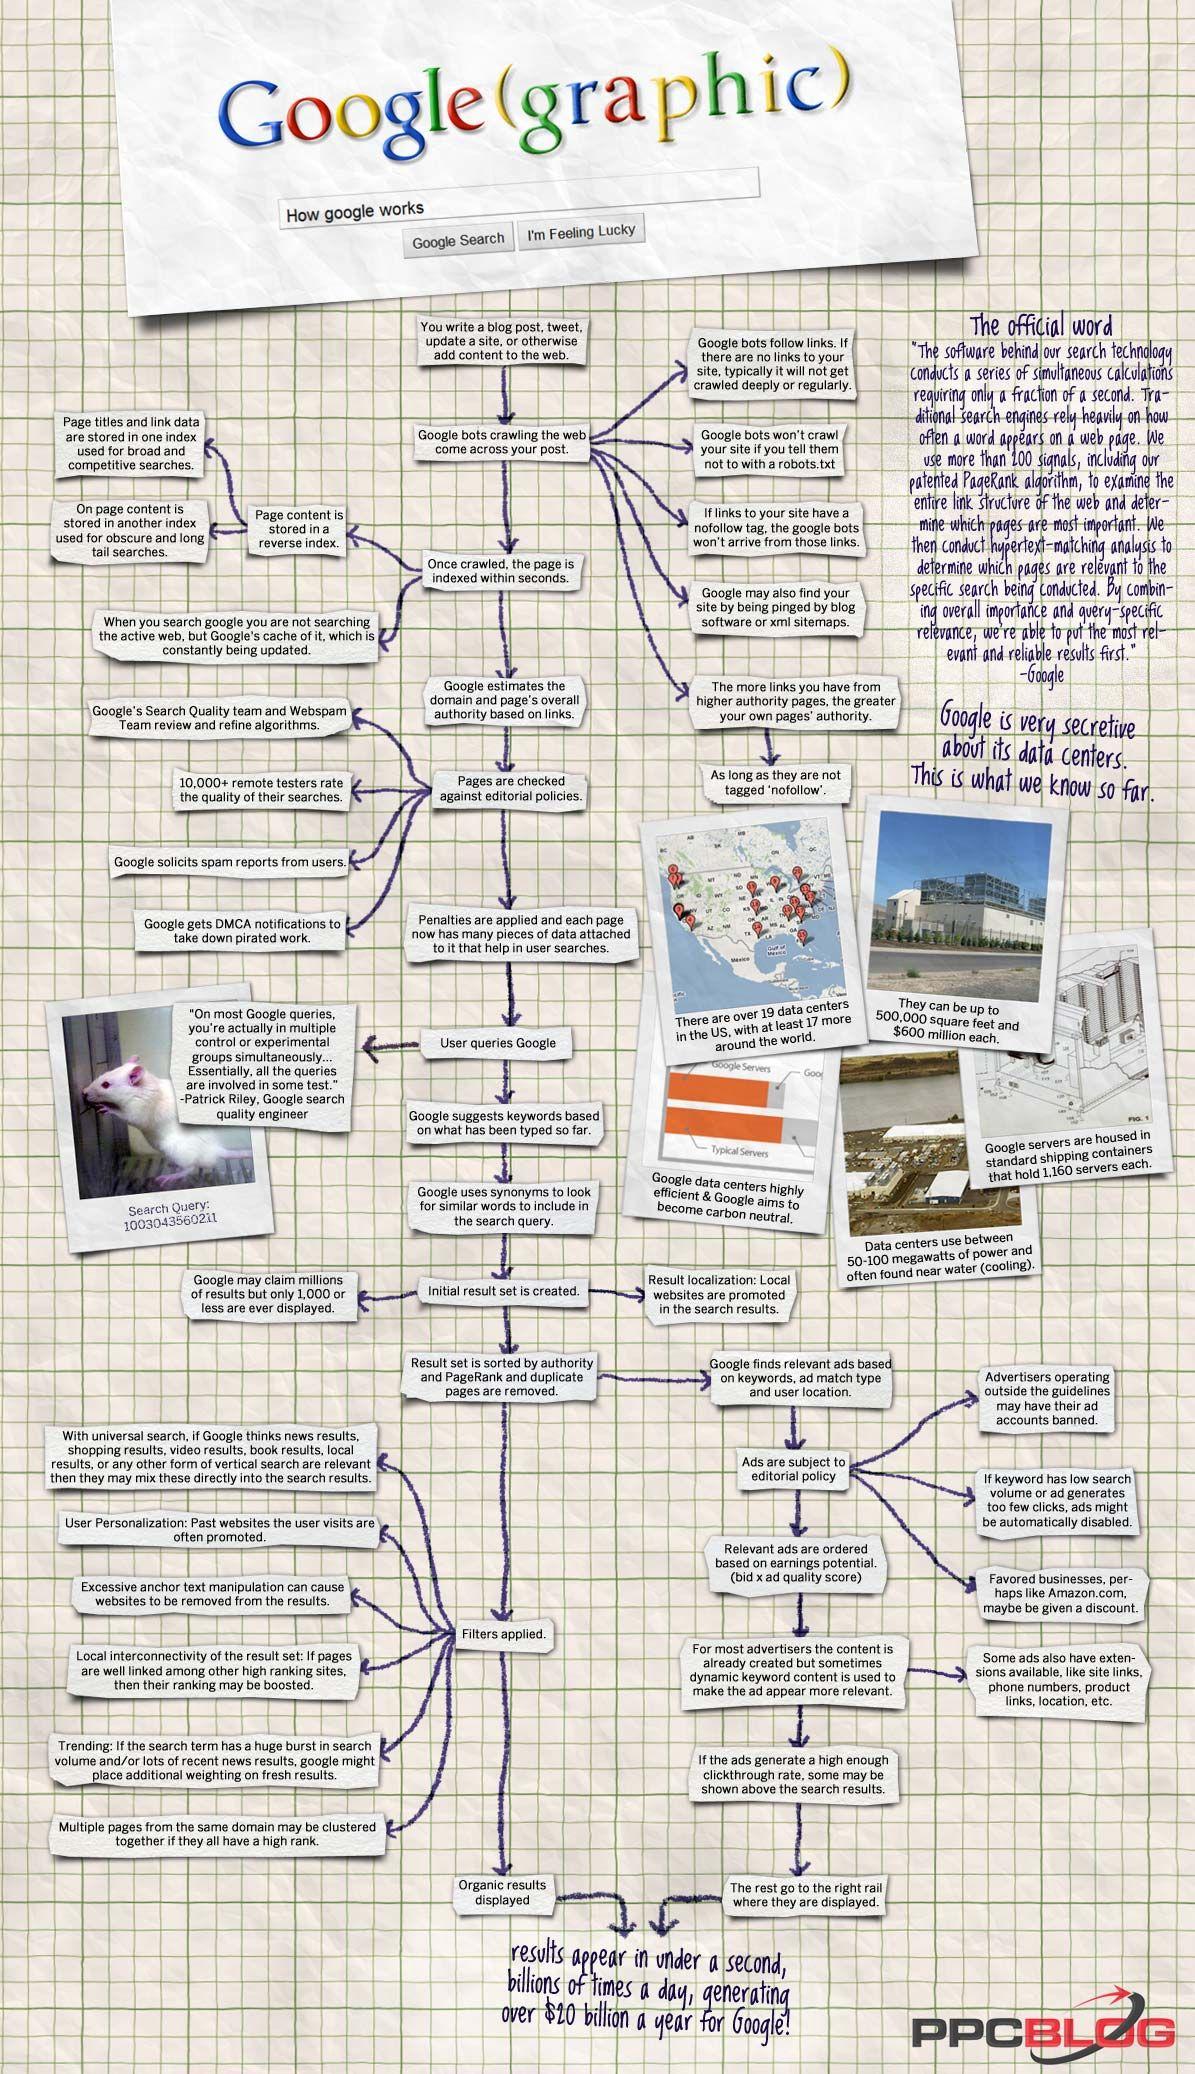 Wie Funktioniert Google Infographic Digital Marketing Social Media